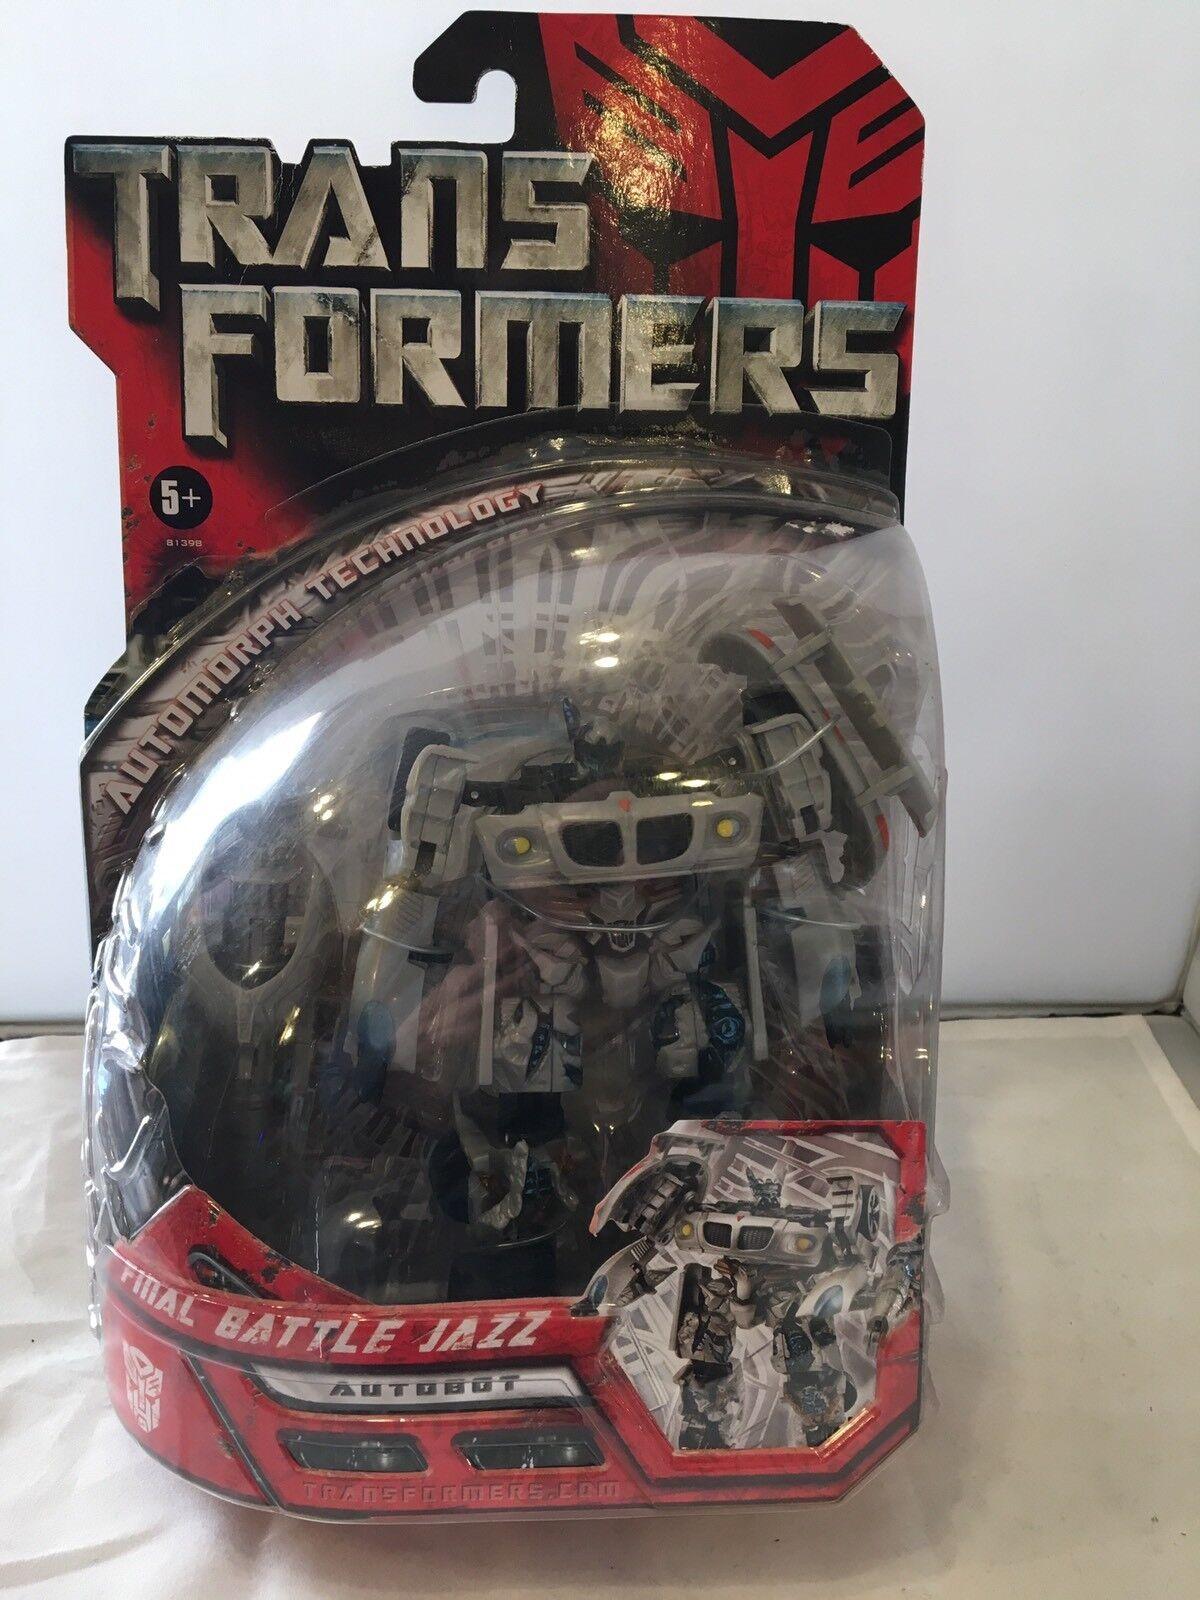 Transformers Movie - Final Battle Jazz.